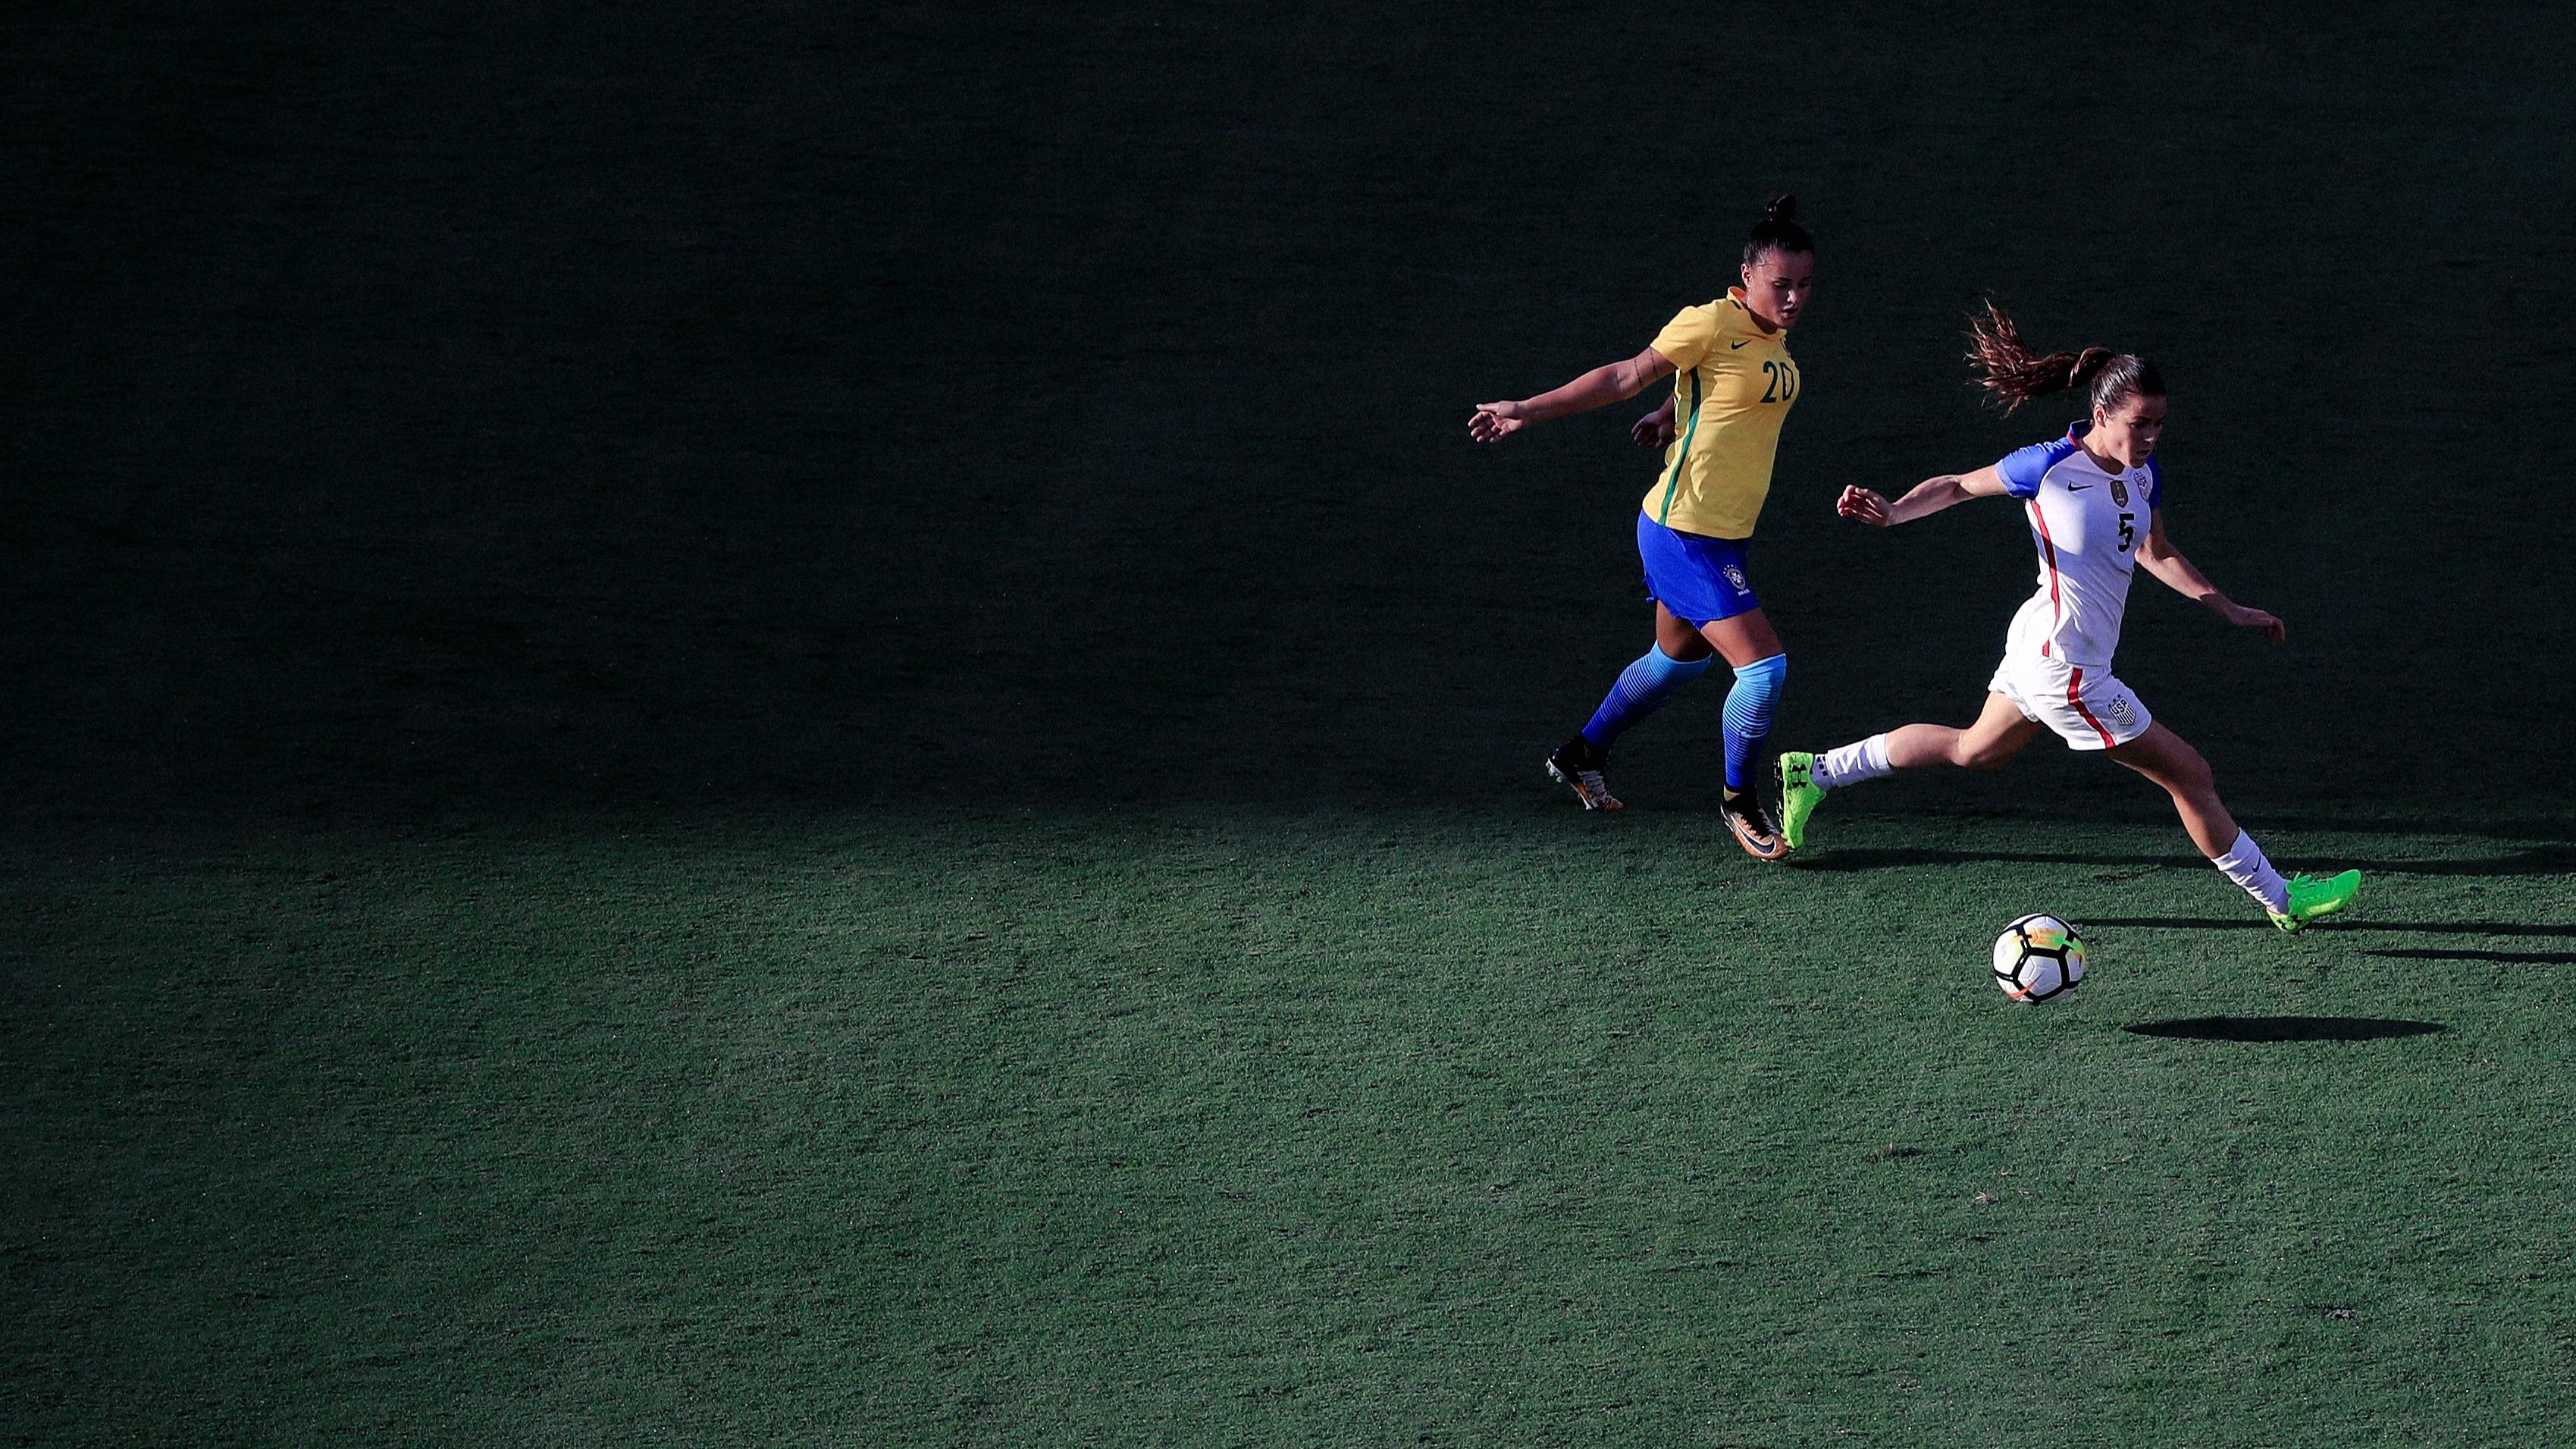 U.S. Soccer: The future of soccer